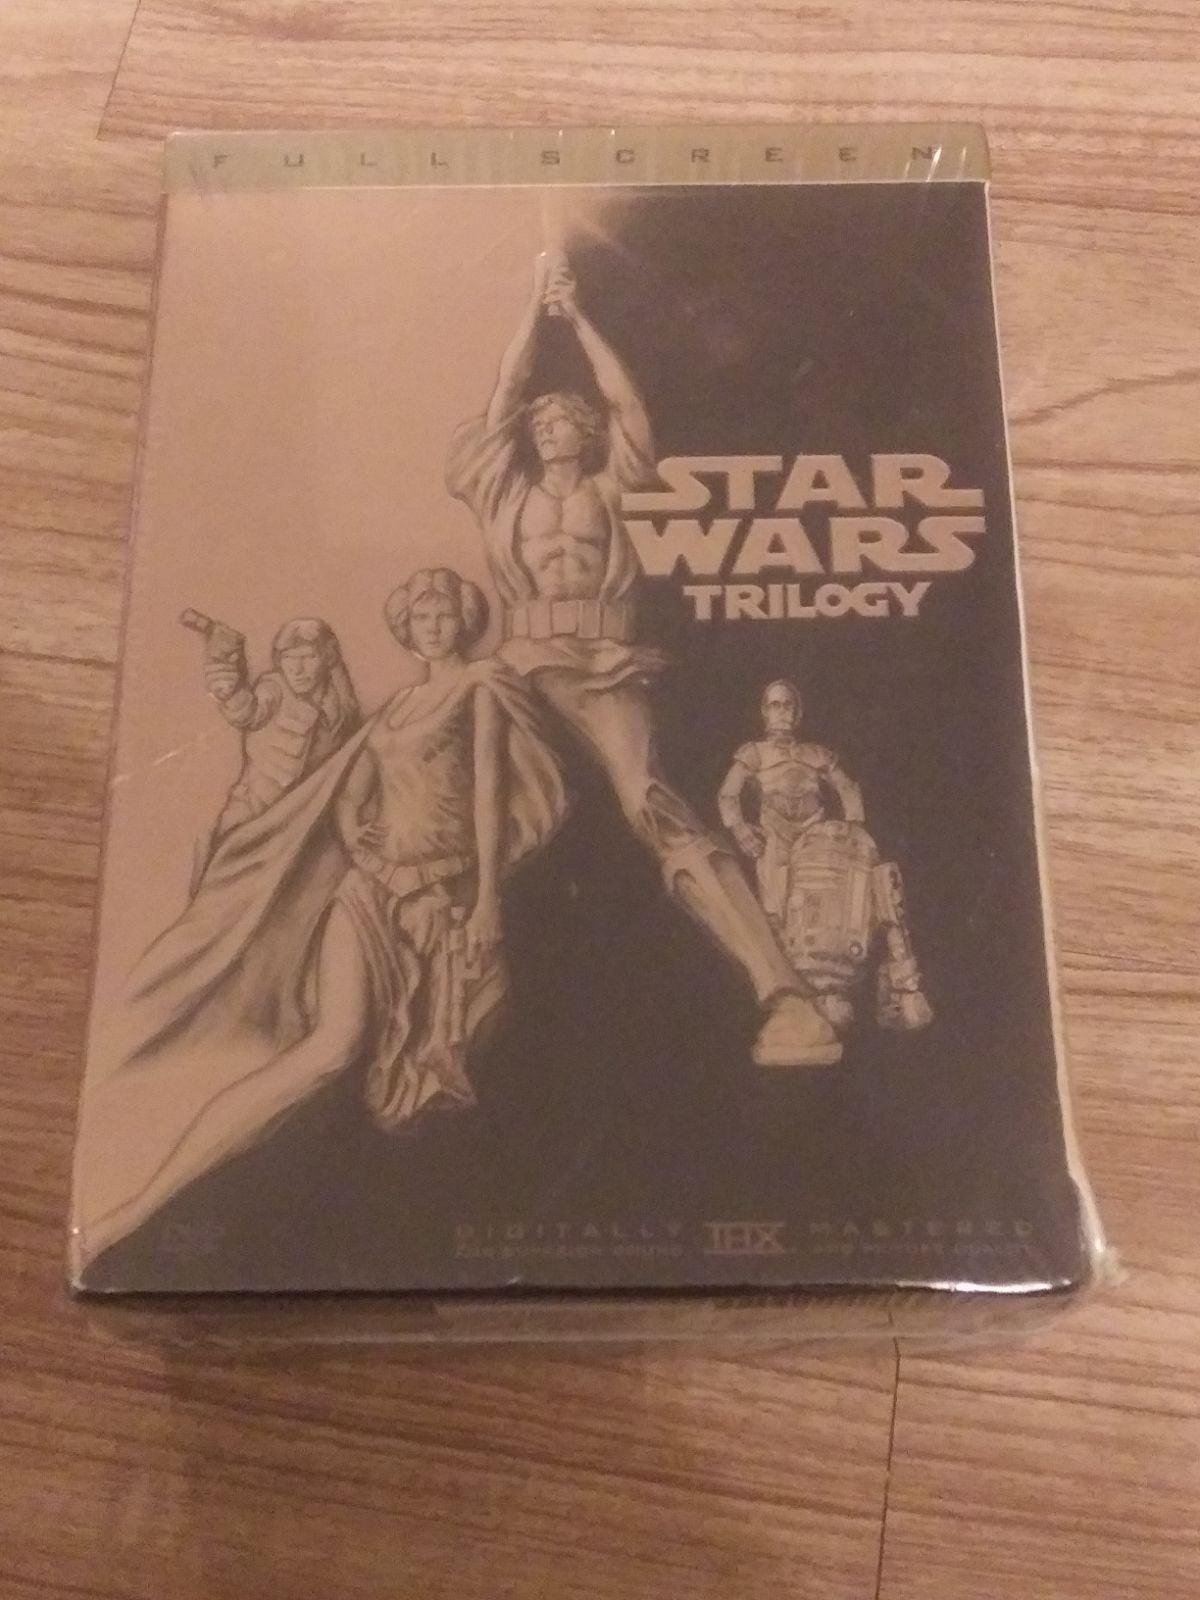 Star Wars Trilogy (DVD) BOX-SET New!